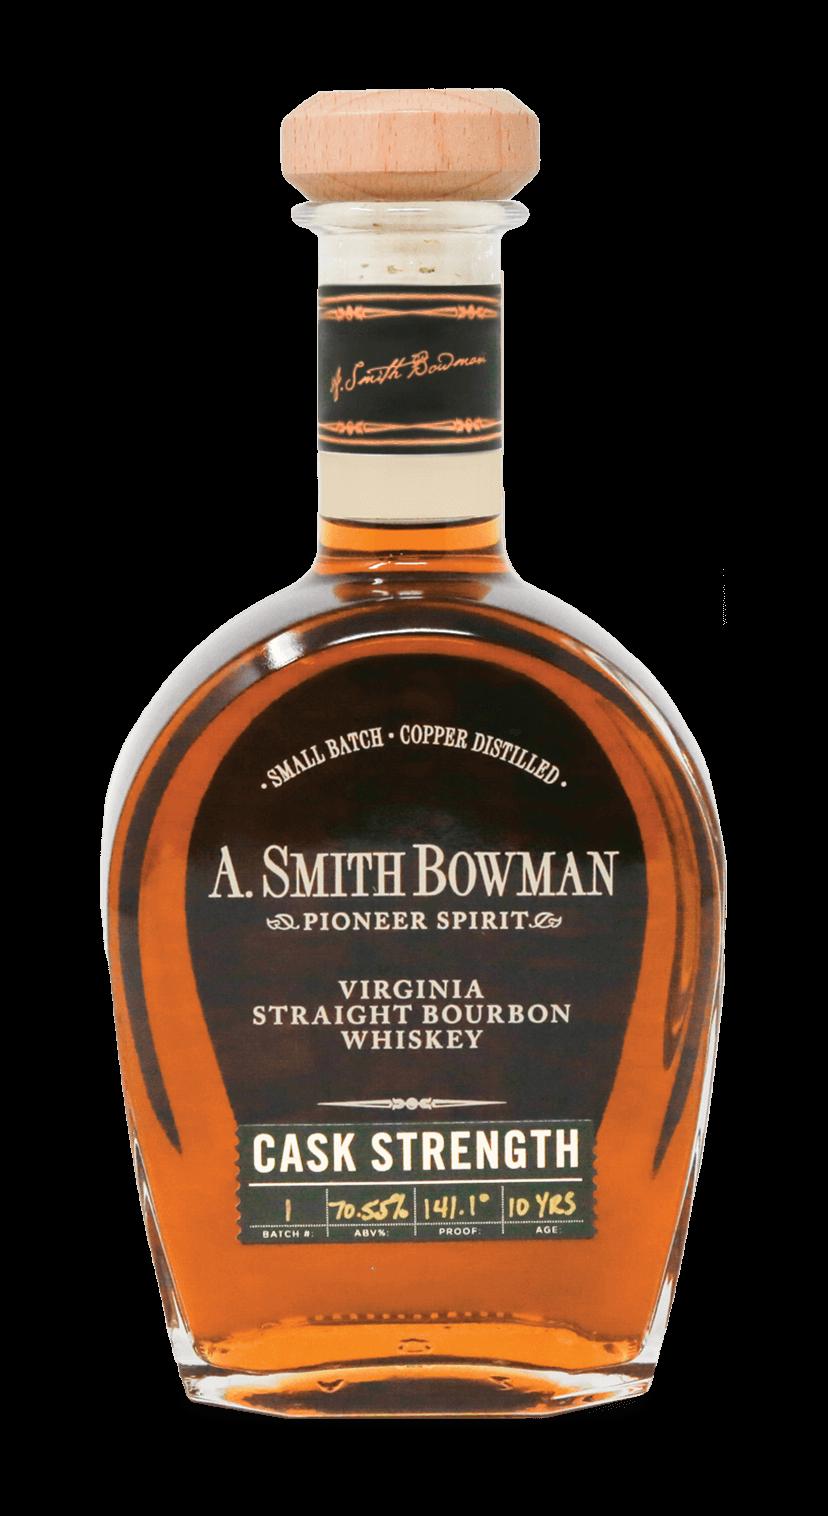 A. Smith Bowman Cask Strength